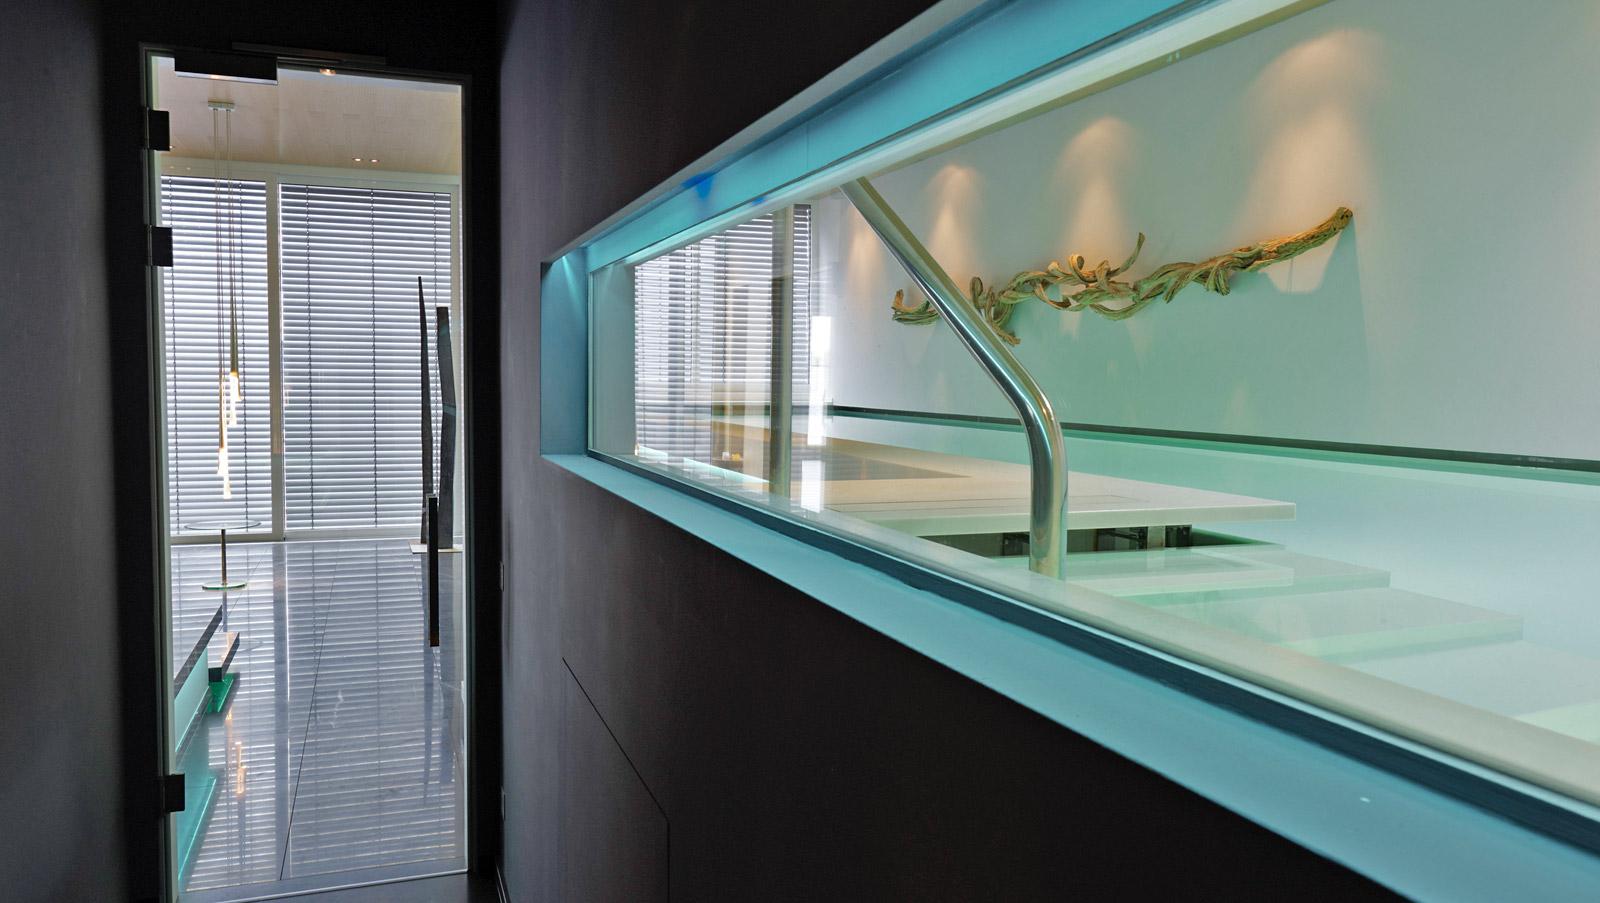 innenarchitektur pfaff innenarchitekt bdia. Black Bedroom Furniture Sets. Home Design Ideas